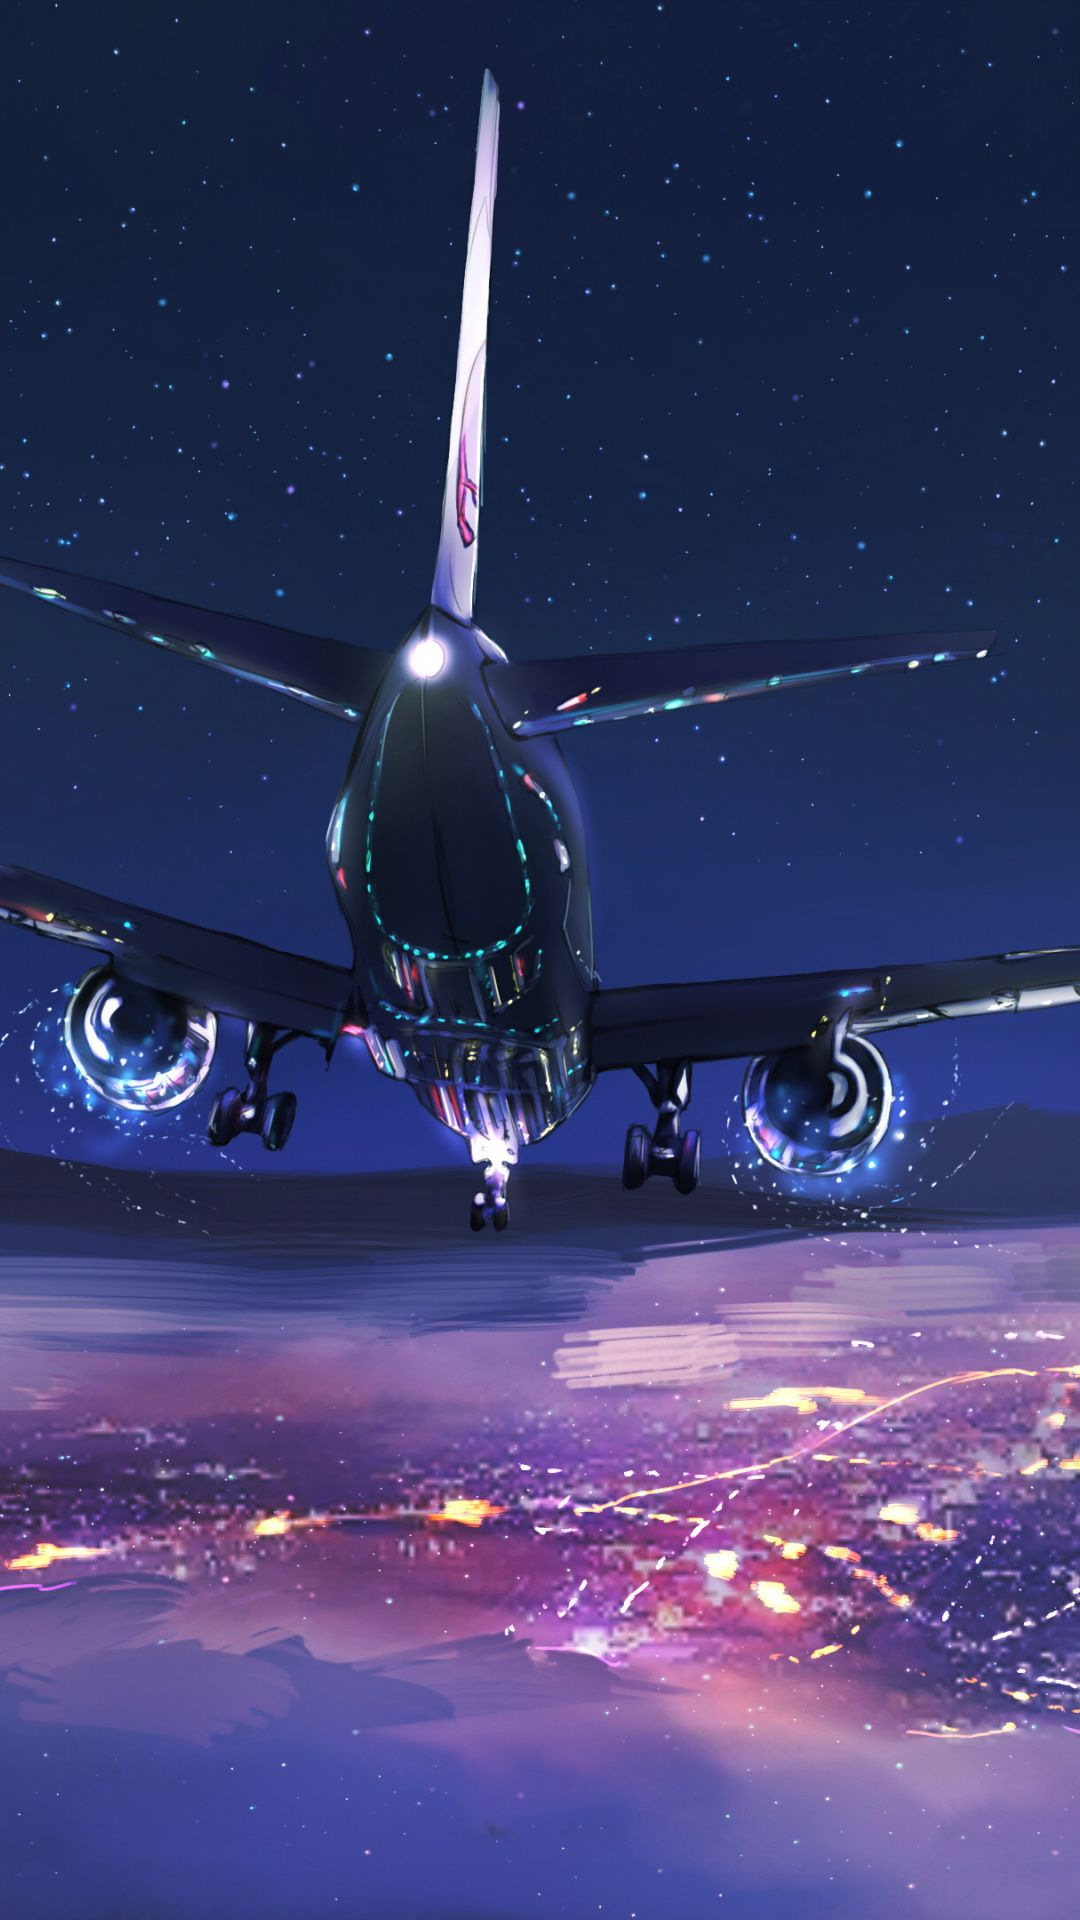 Aircraft Sky Night Flight Digital Art 1080x1920 Wallpaper Airplane Wallpaper Airplane Photography Plane Photography